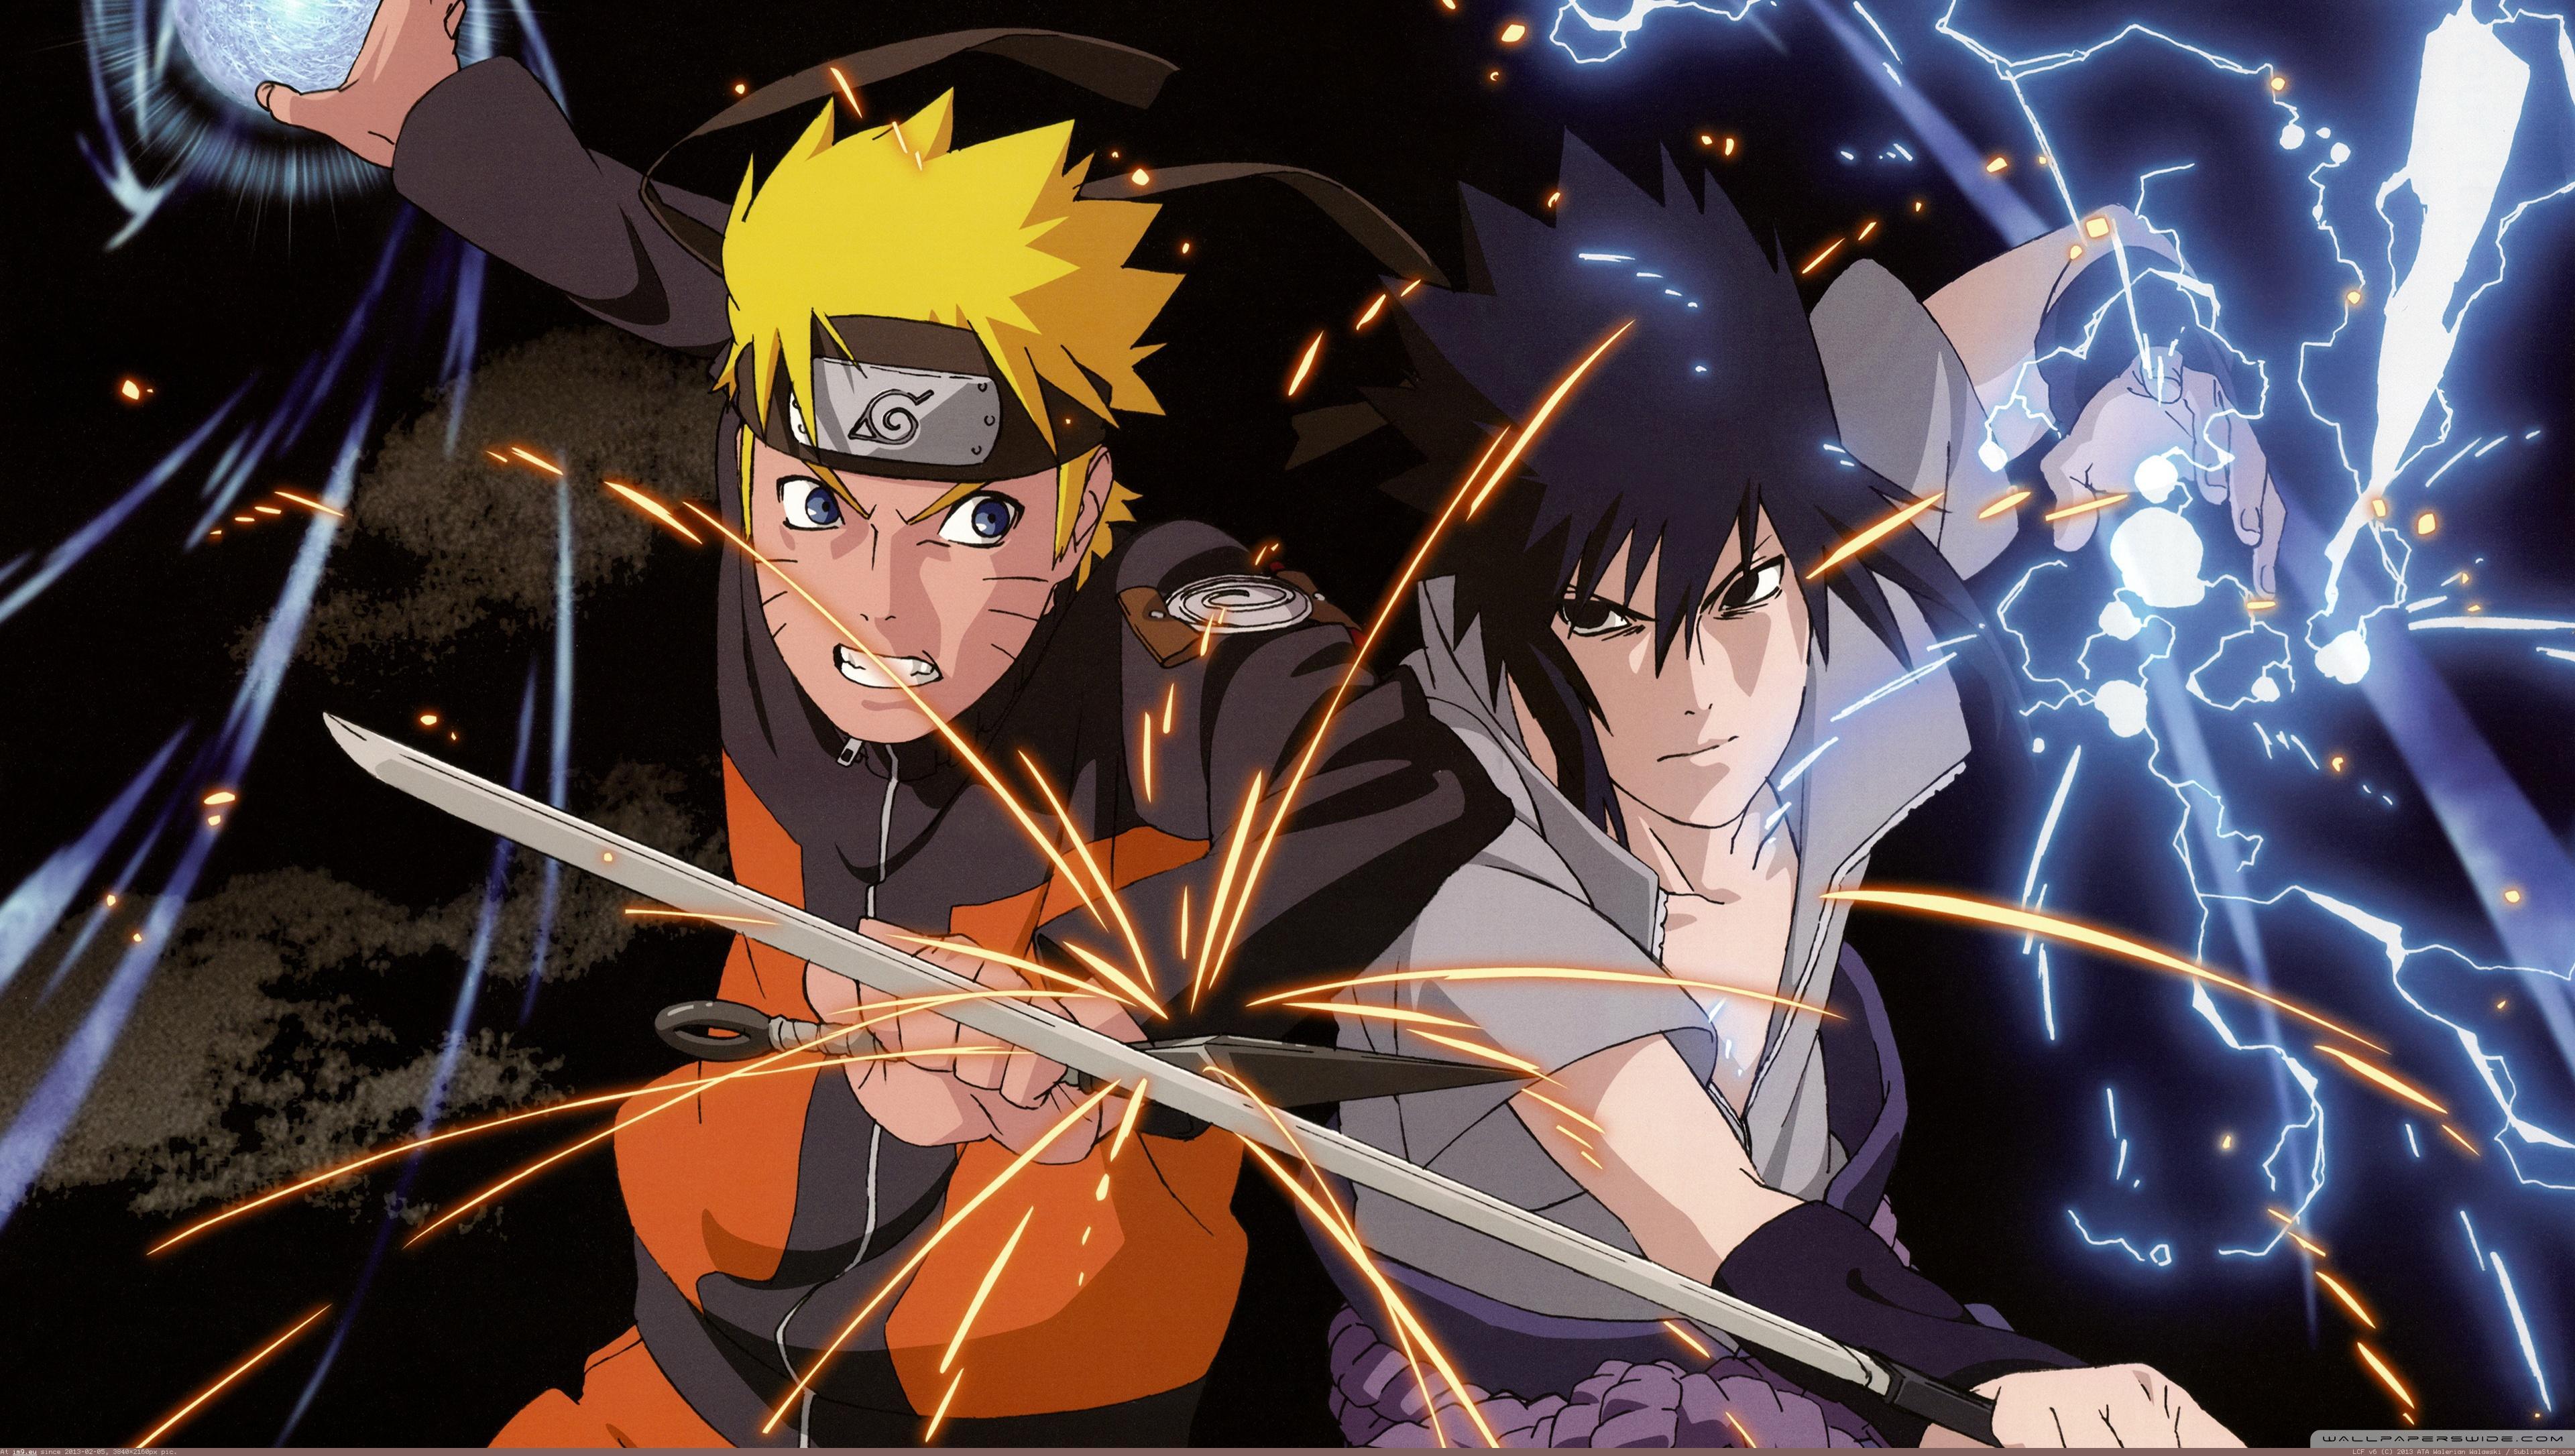 wallpaper Naruto Backgrounds hd wallpaper background desktop 3840x2172